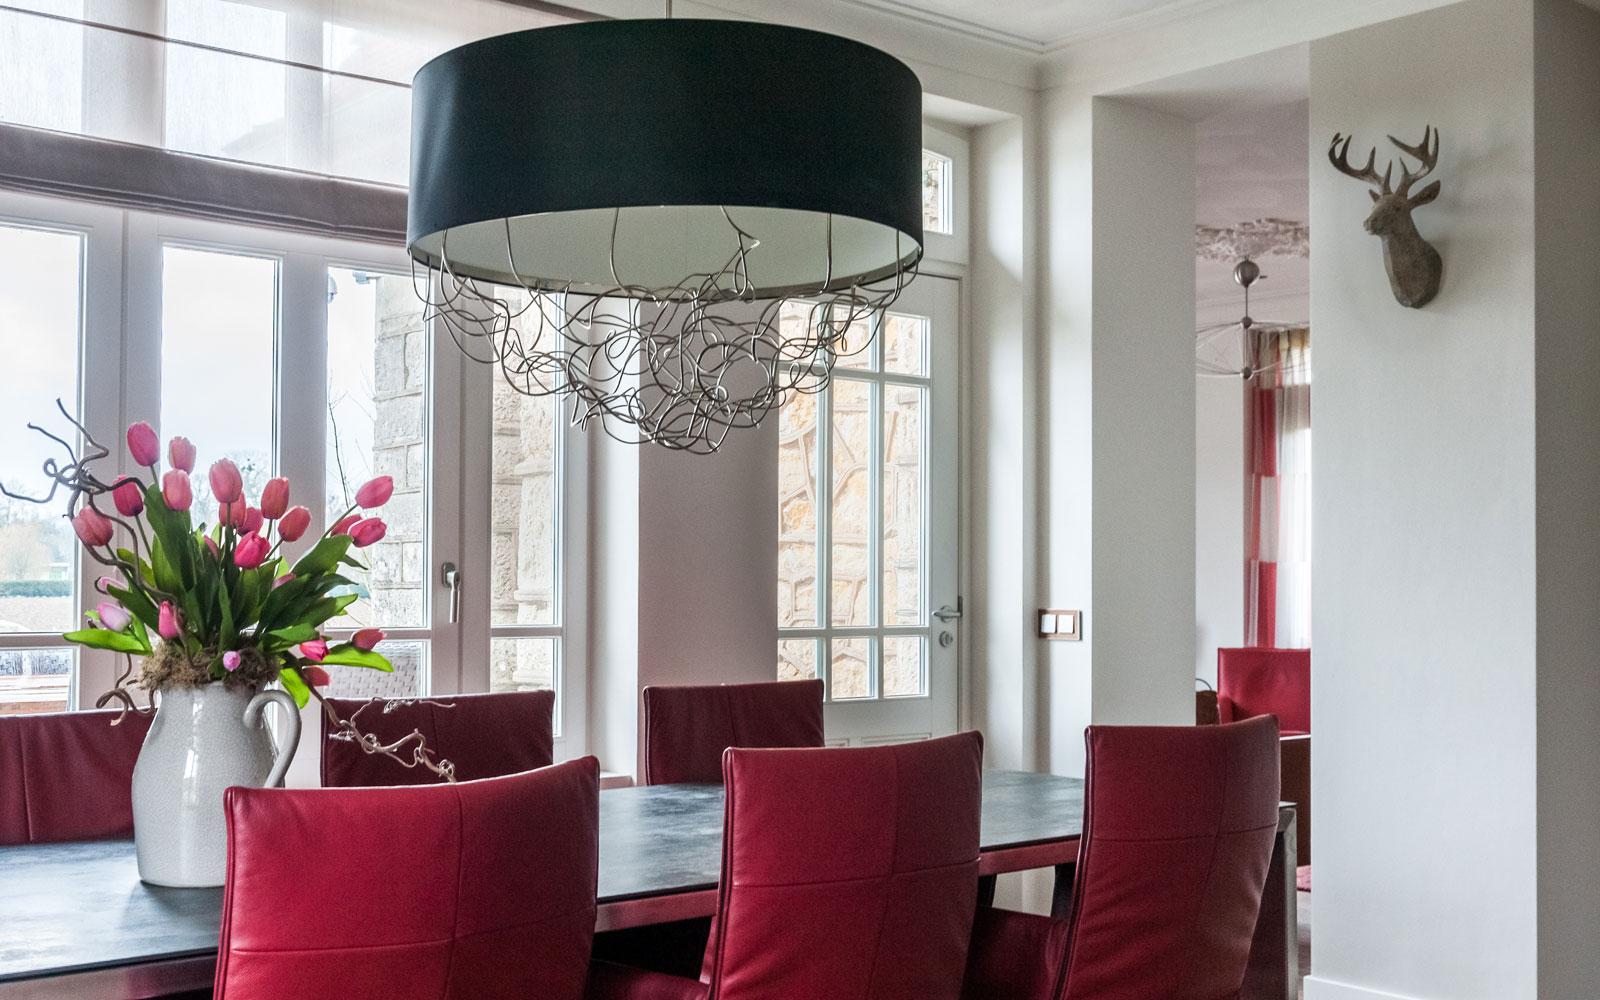 MarStyling, Keuken, Modern klassiek interieur, eettafel, stoelen, eetkamer